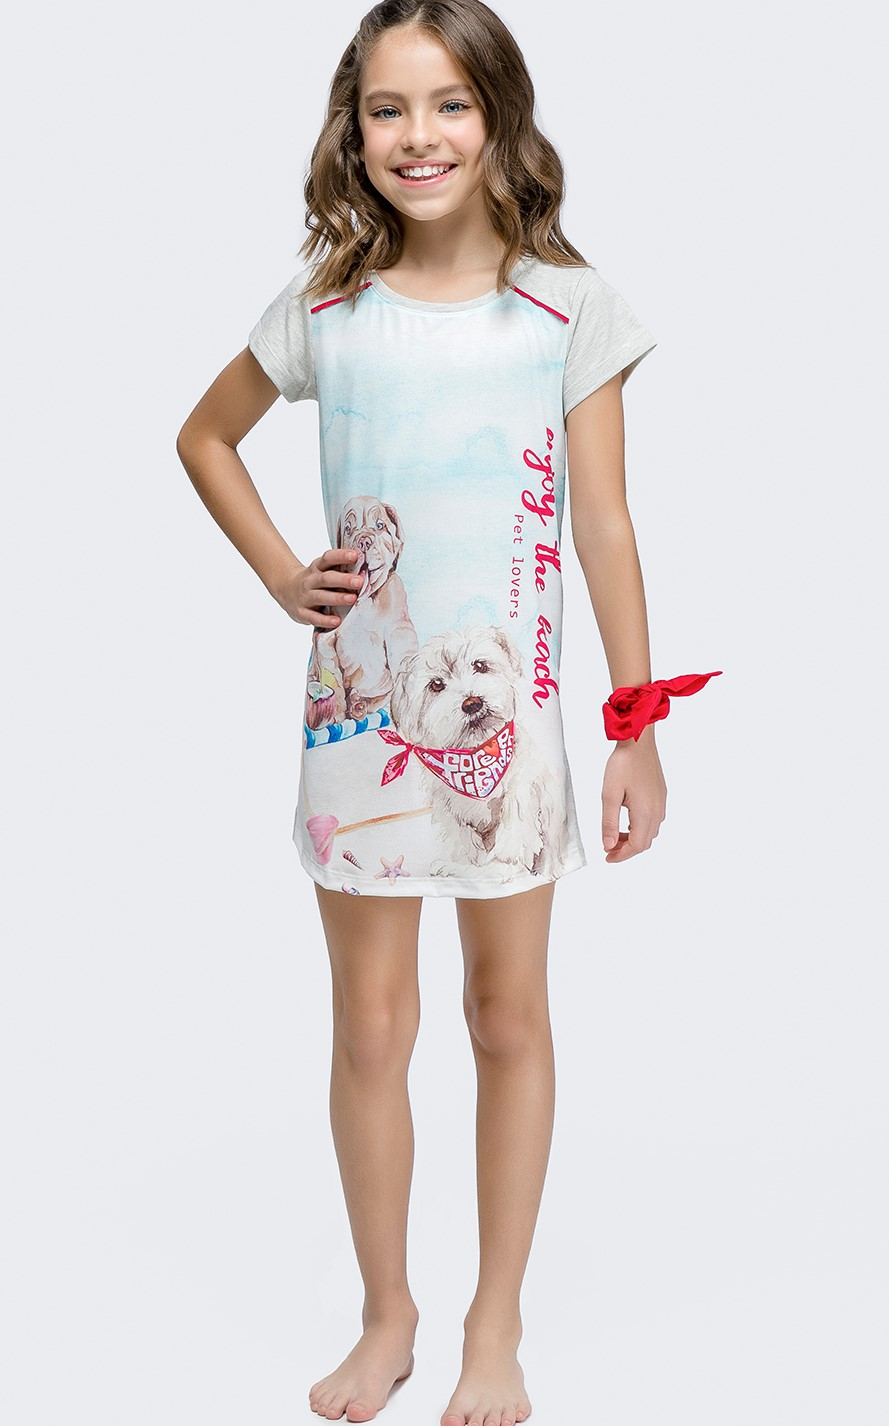 camisola manga curta infantil